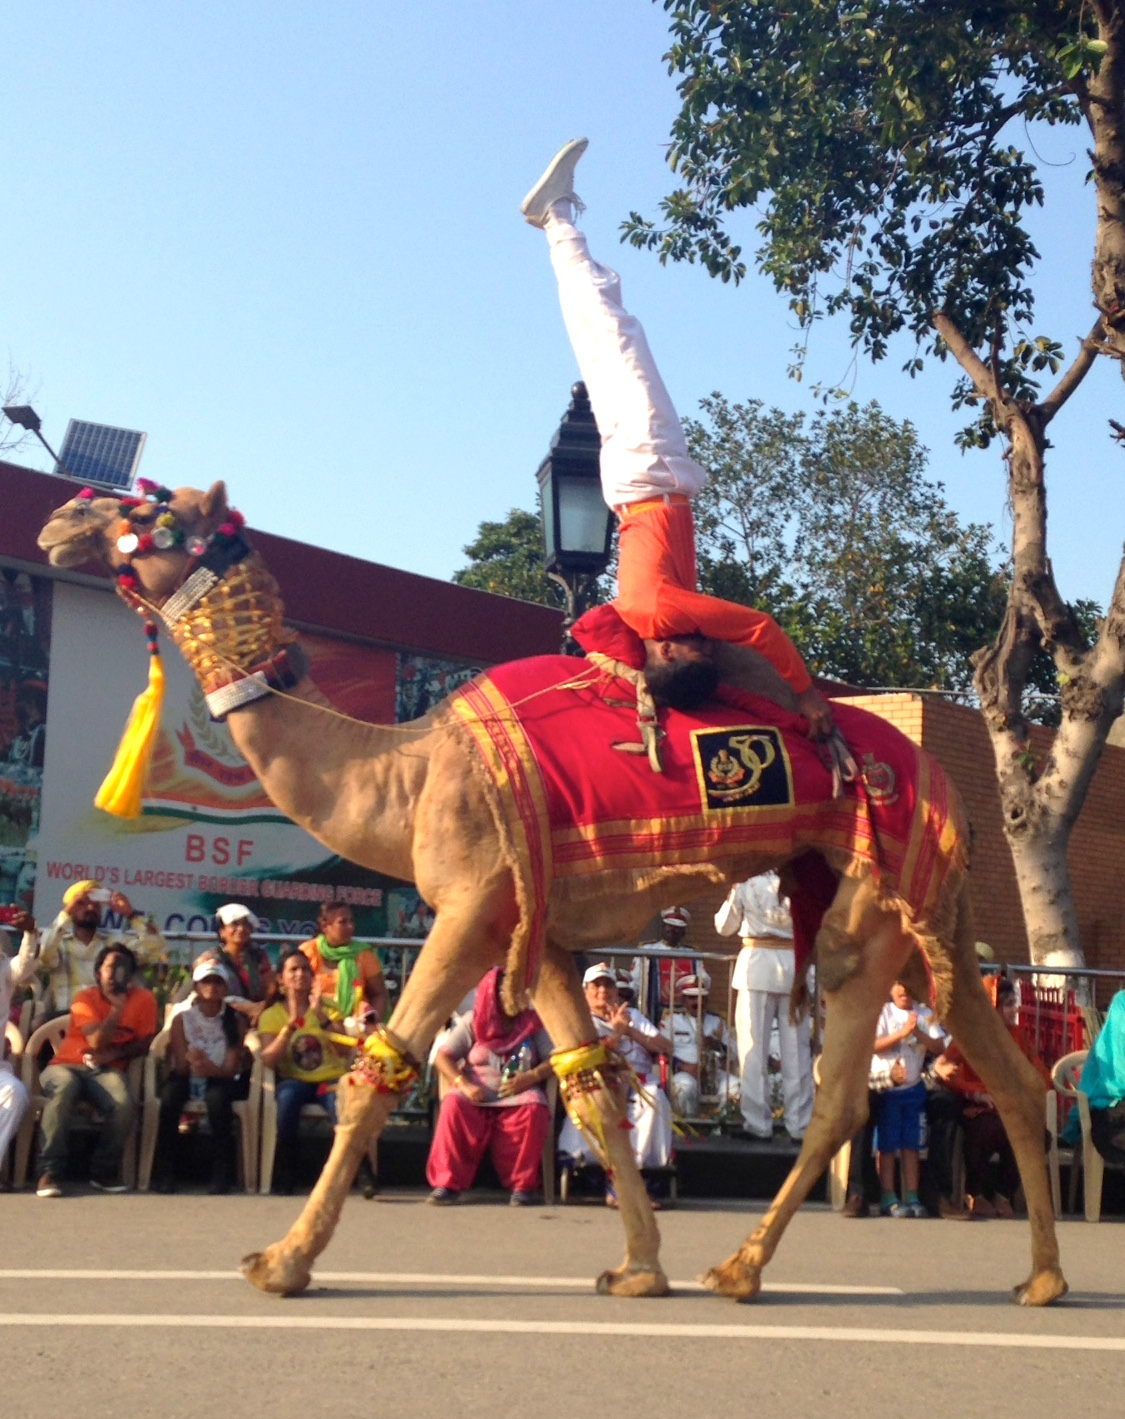 camel yoga.JPG